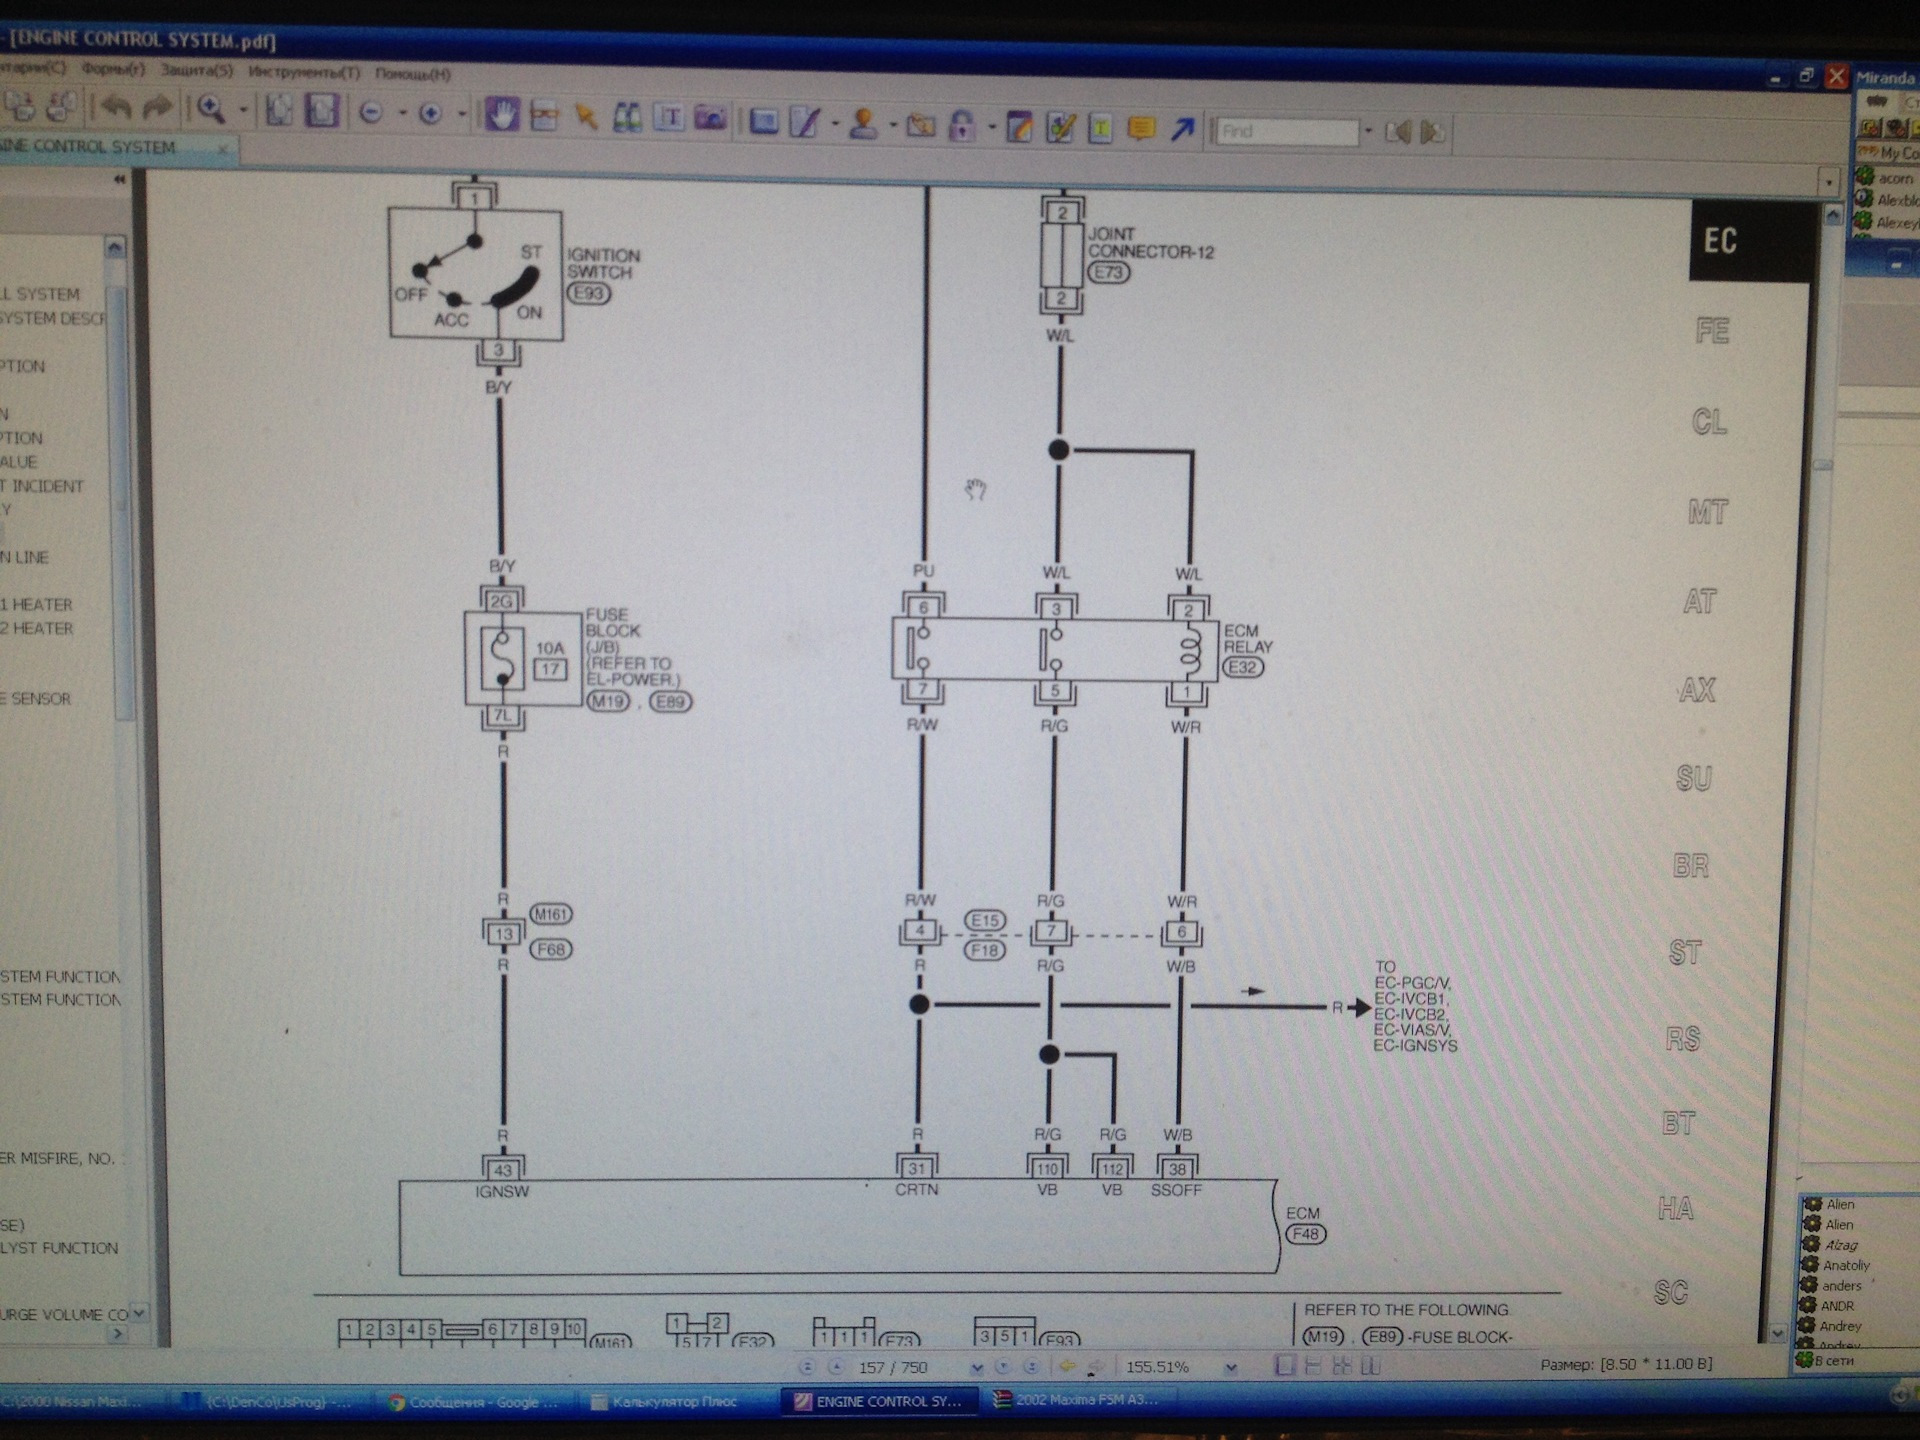 hight resolution of nissan vh41 wiring diagram wiring library rh 97 skriptoase de nissan vg engine nissan vg30e engine